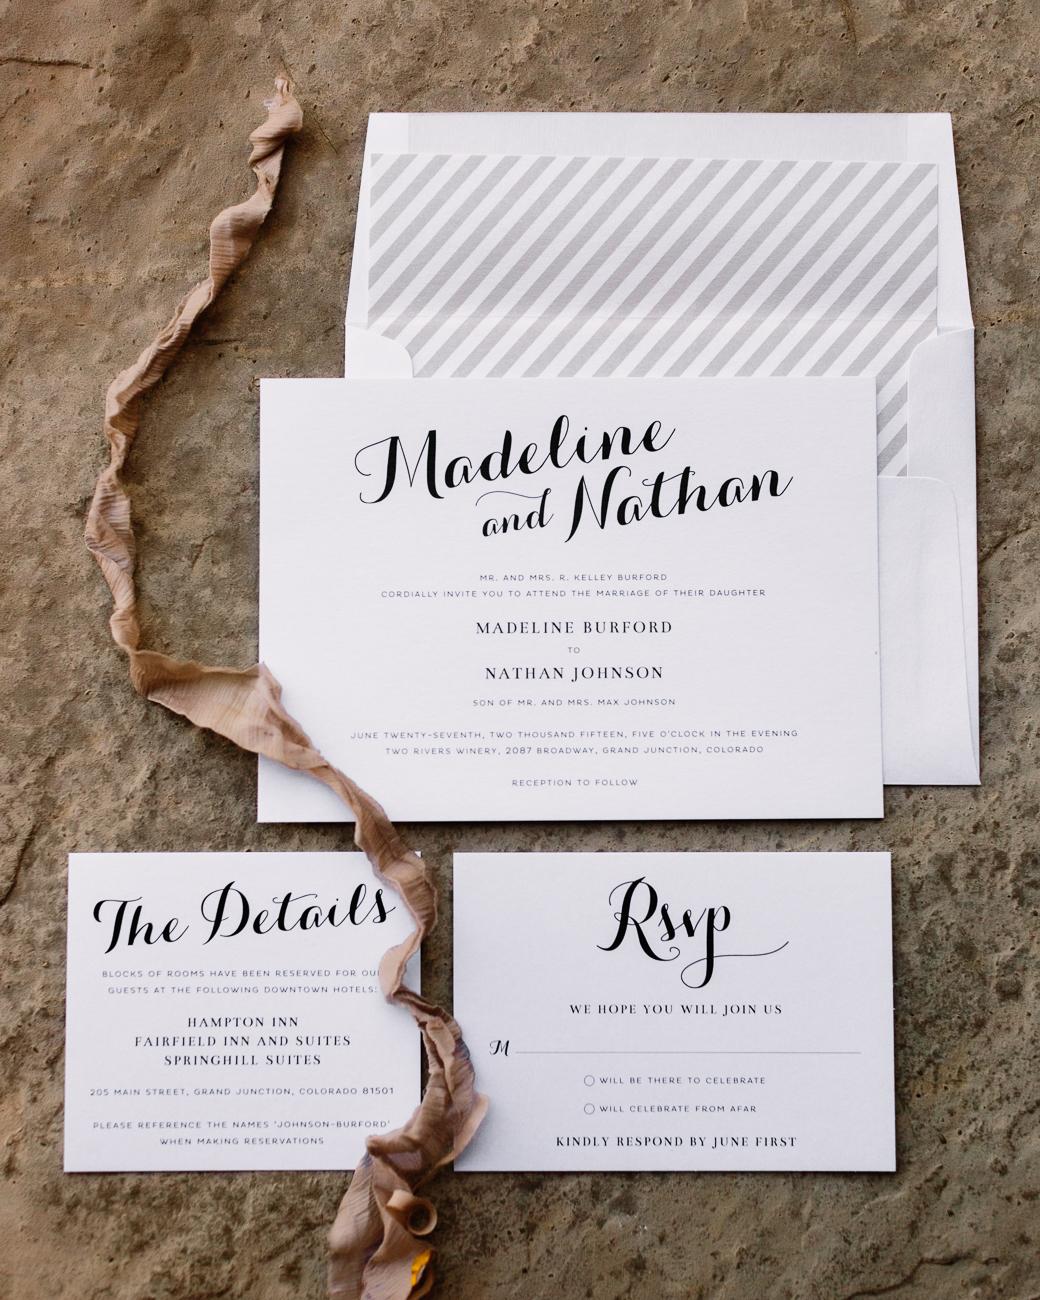 Grand Junction Wedding | Black and White Wedding Stationery by Shine Wedding Invitations | Cat Mayer Photography | www.catmayerstudio.com